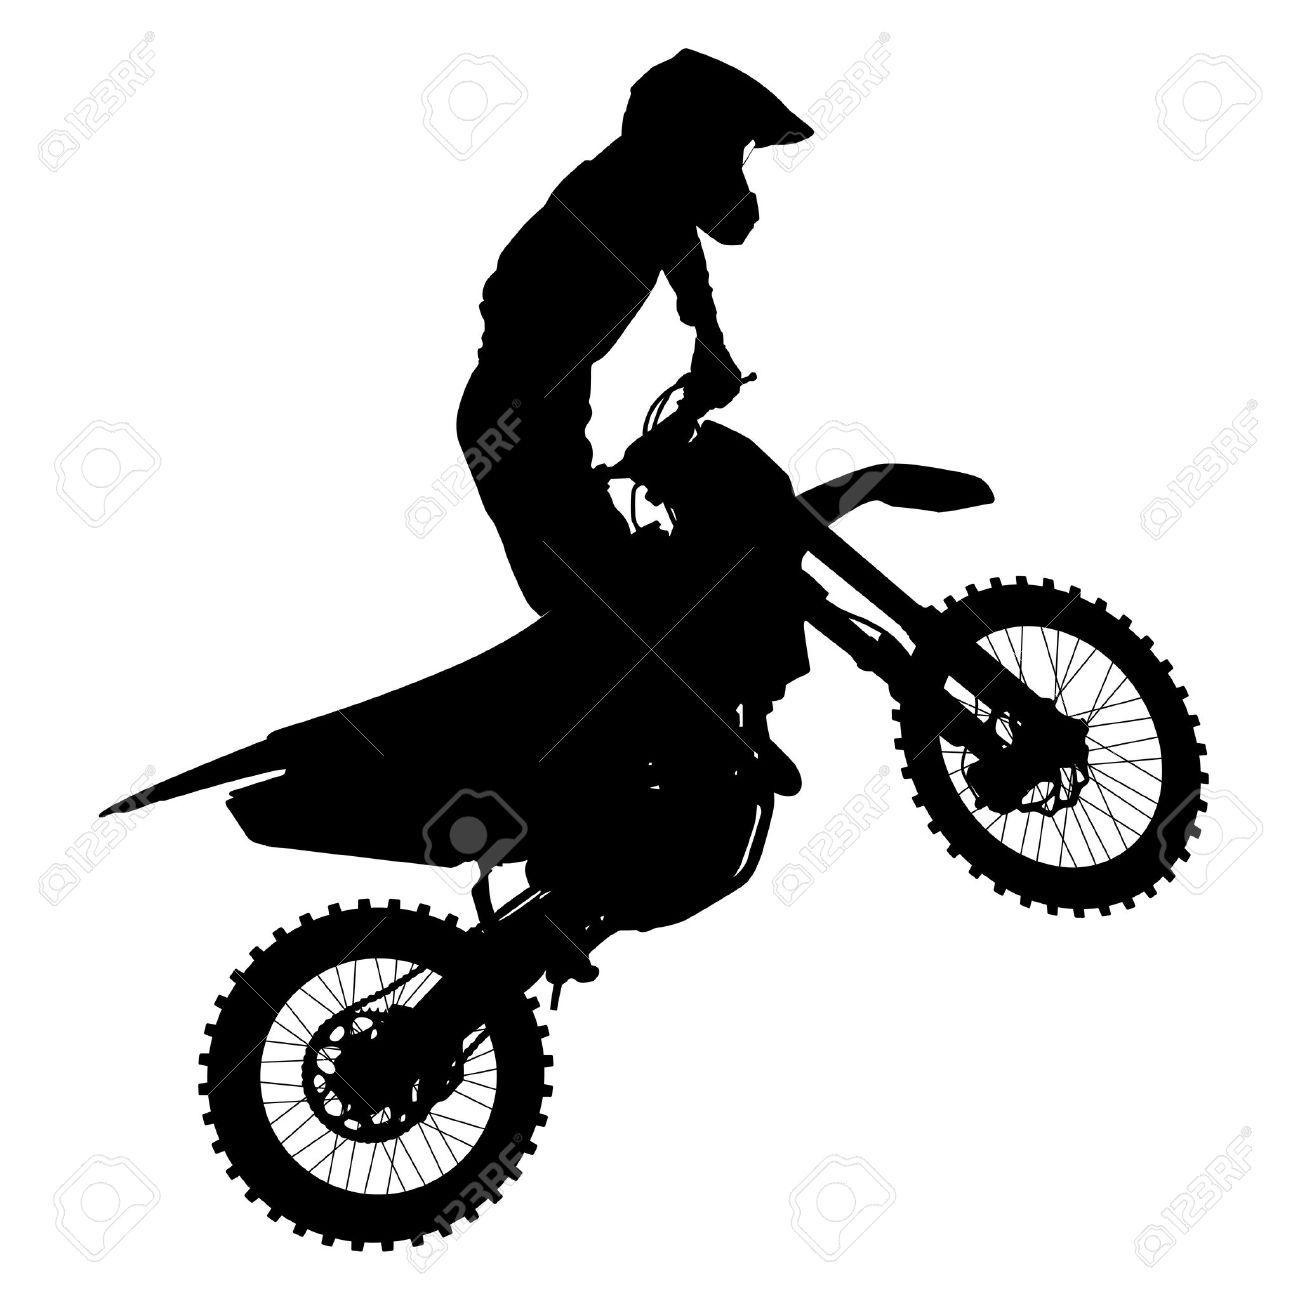 pin by dani cyr on canvas creations bike silhouette